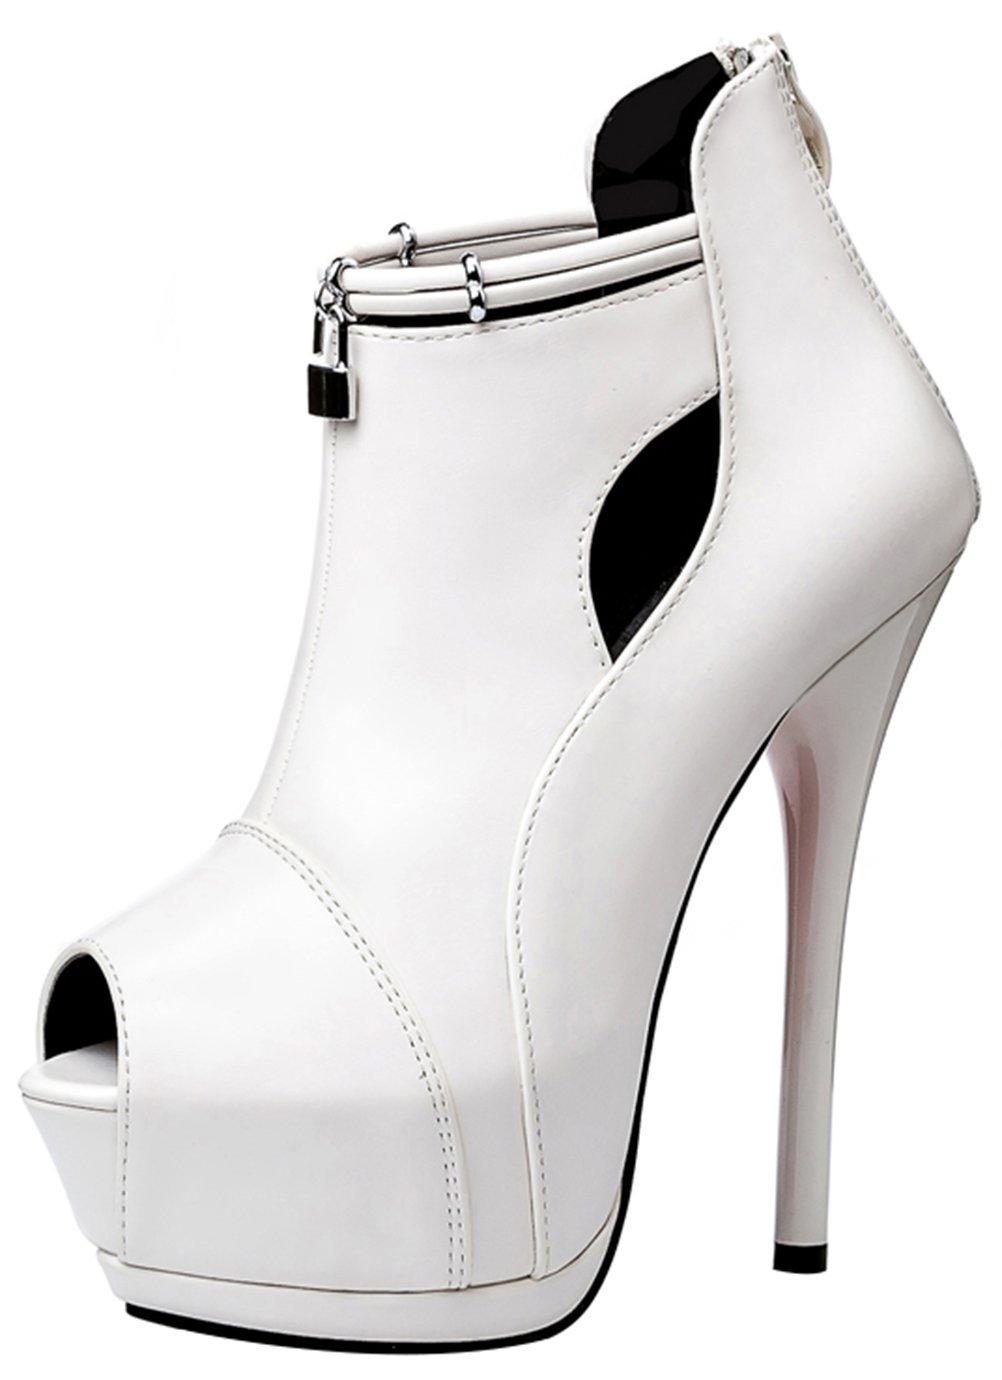 T&Mates Womens Trendy Peep Toe Platform Anti-Slip Extreme High Stiletto Heel Back Zip Pumps Booties (6 B(M) US,White)